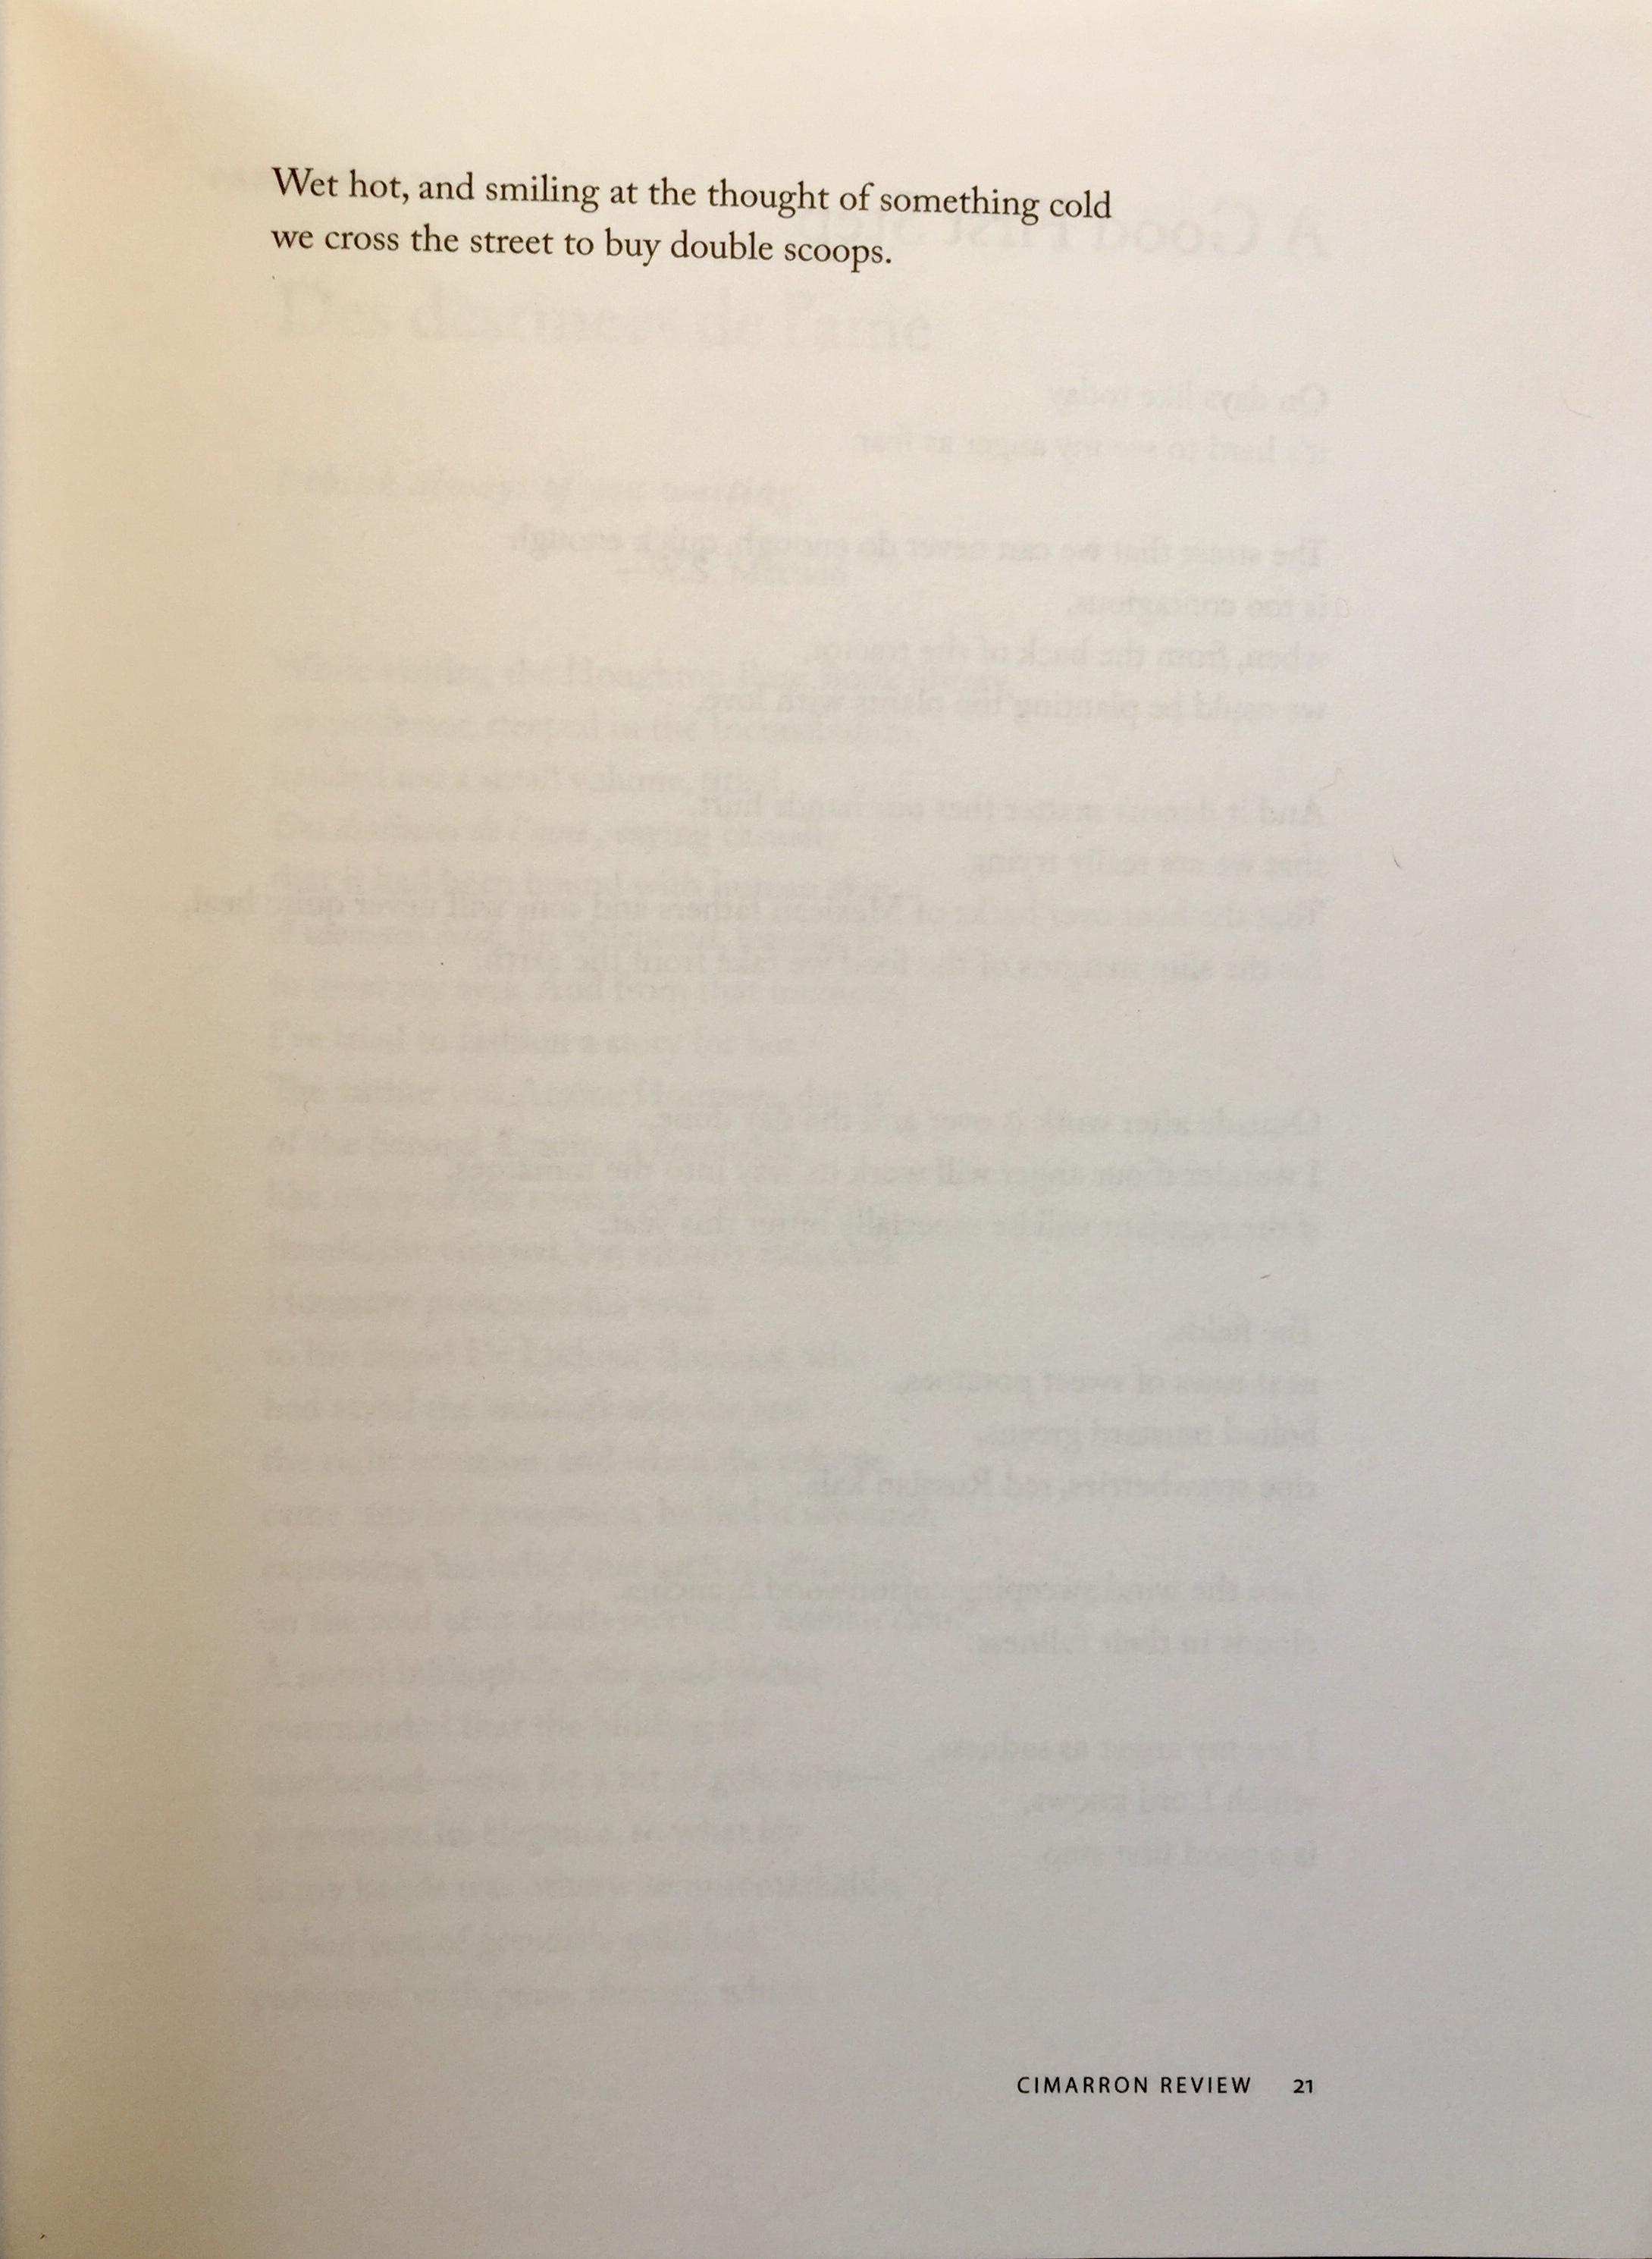 Cimarron Review Poem 3.jpg